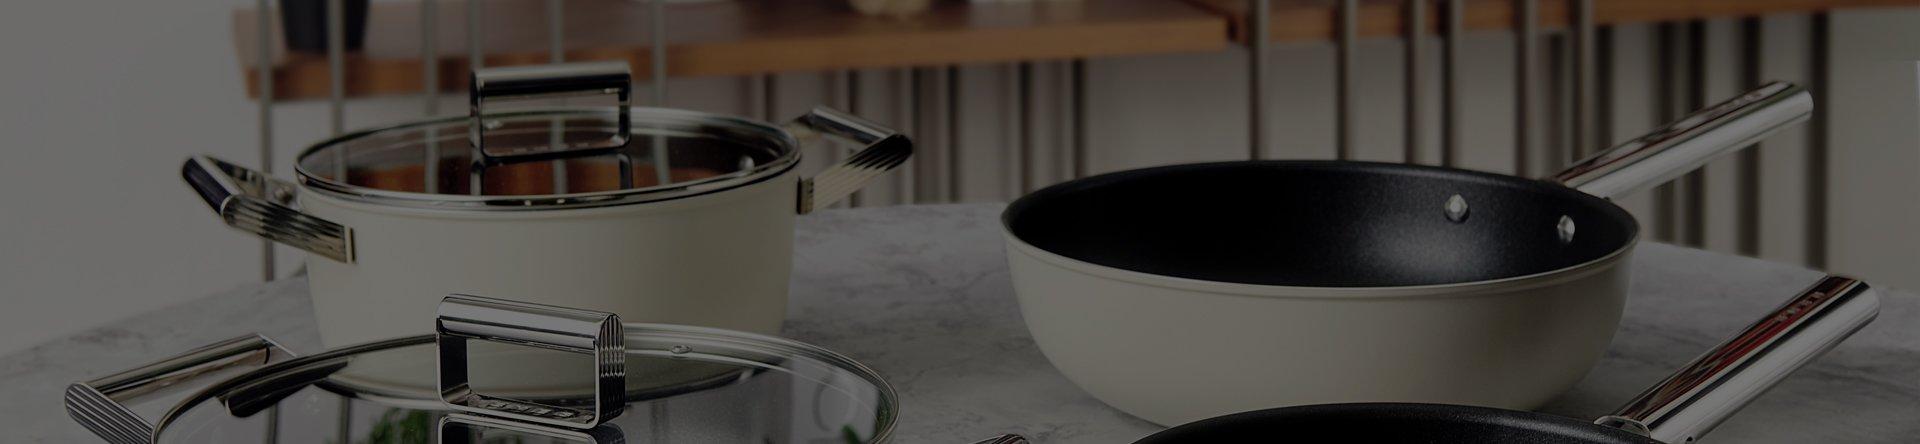 Menaje de cocina Smeg   Tienda online oficial   Shop Smeg